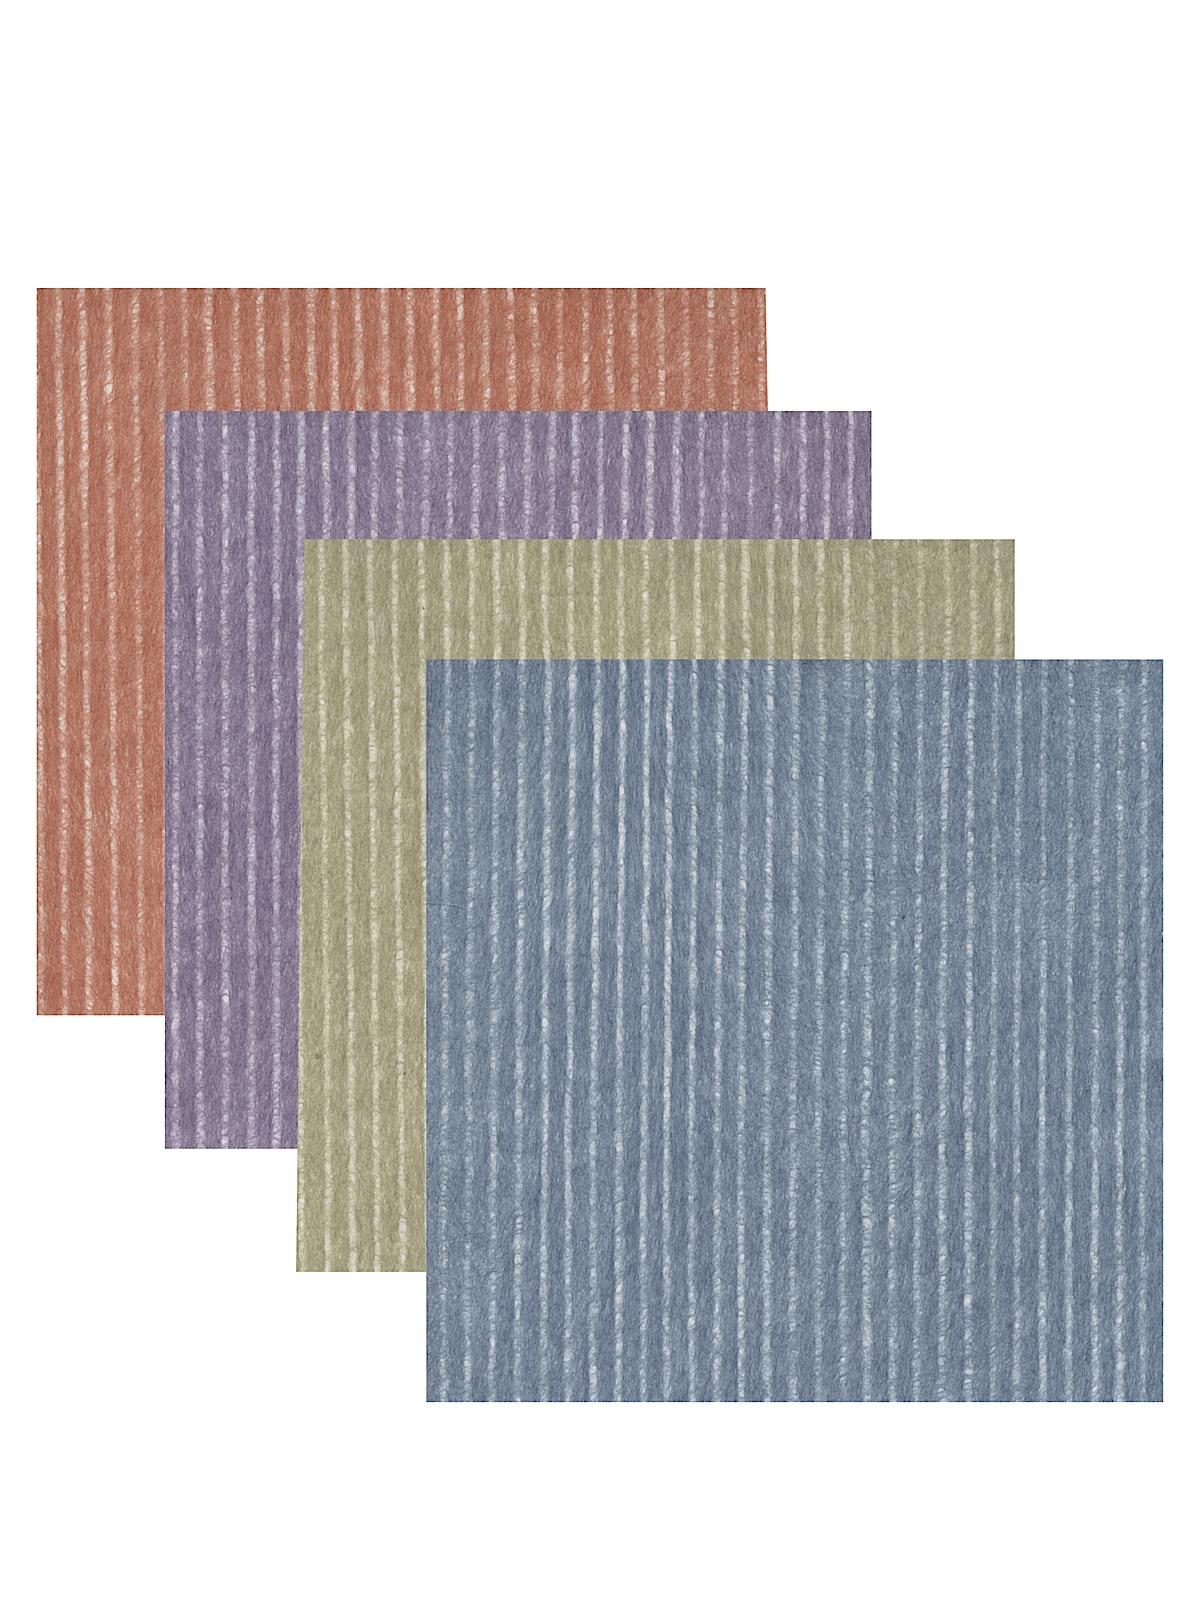 Origami Paper 6 In. X 6 In. Kasane Rattan 12 Sheets